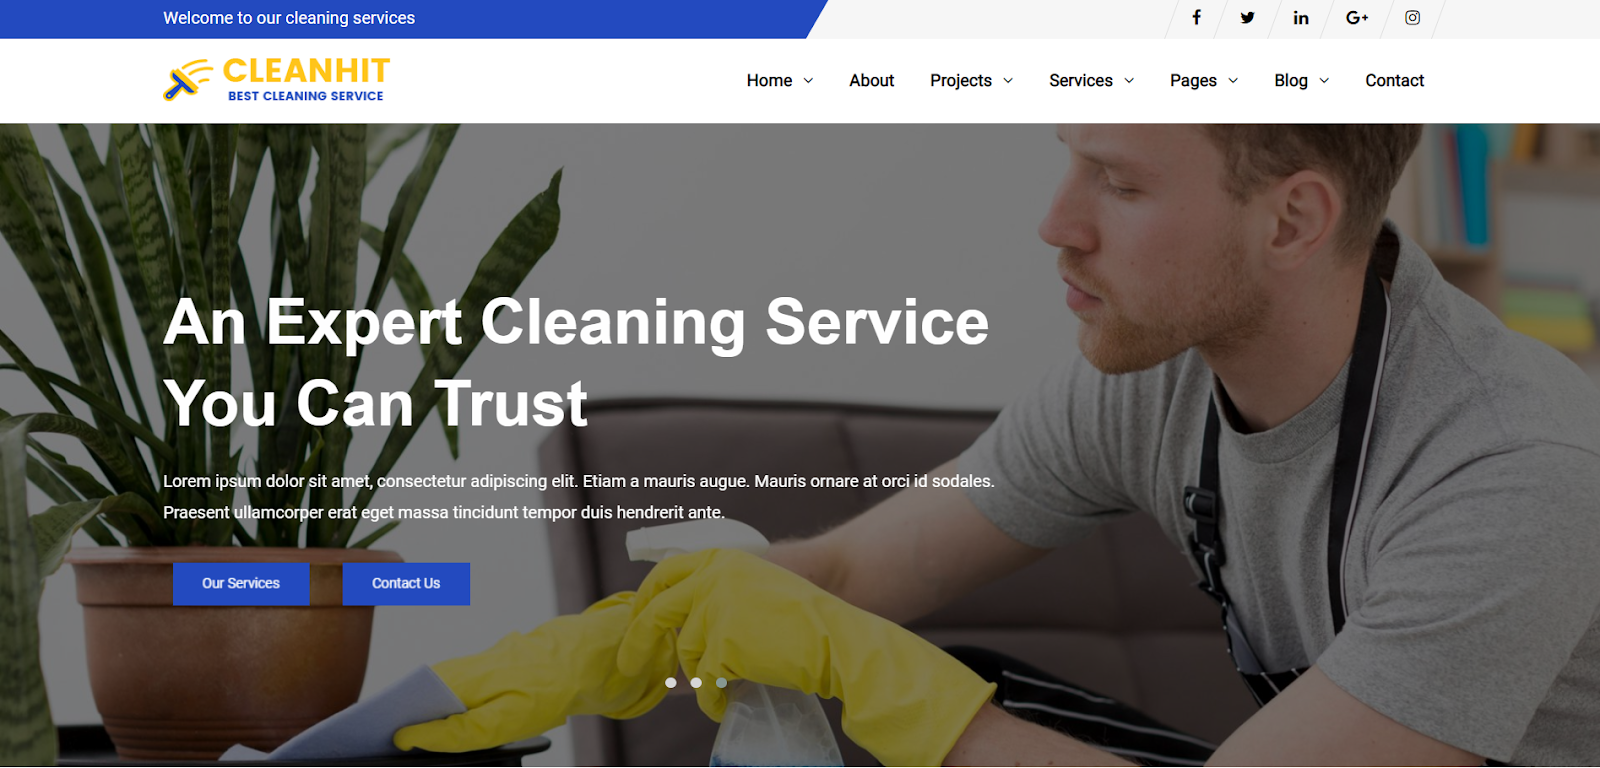 WordPress themes - Cleanhit loading speed